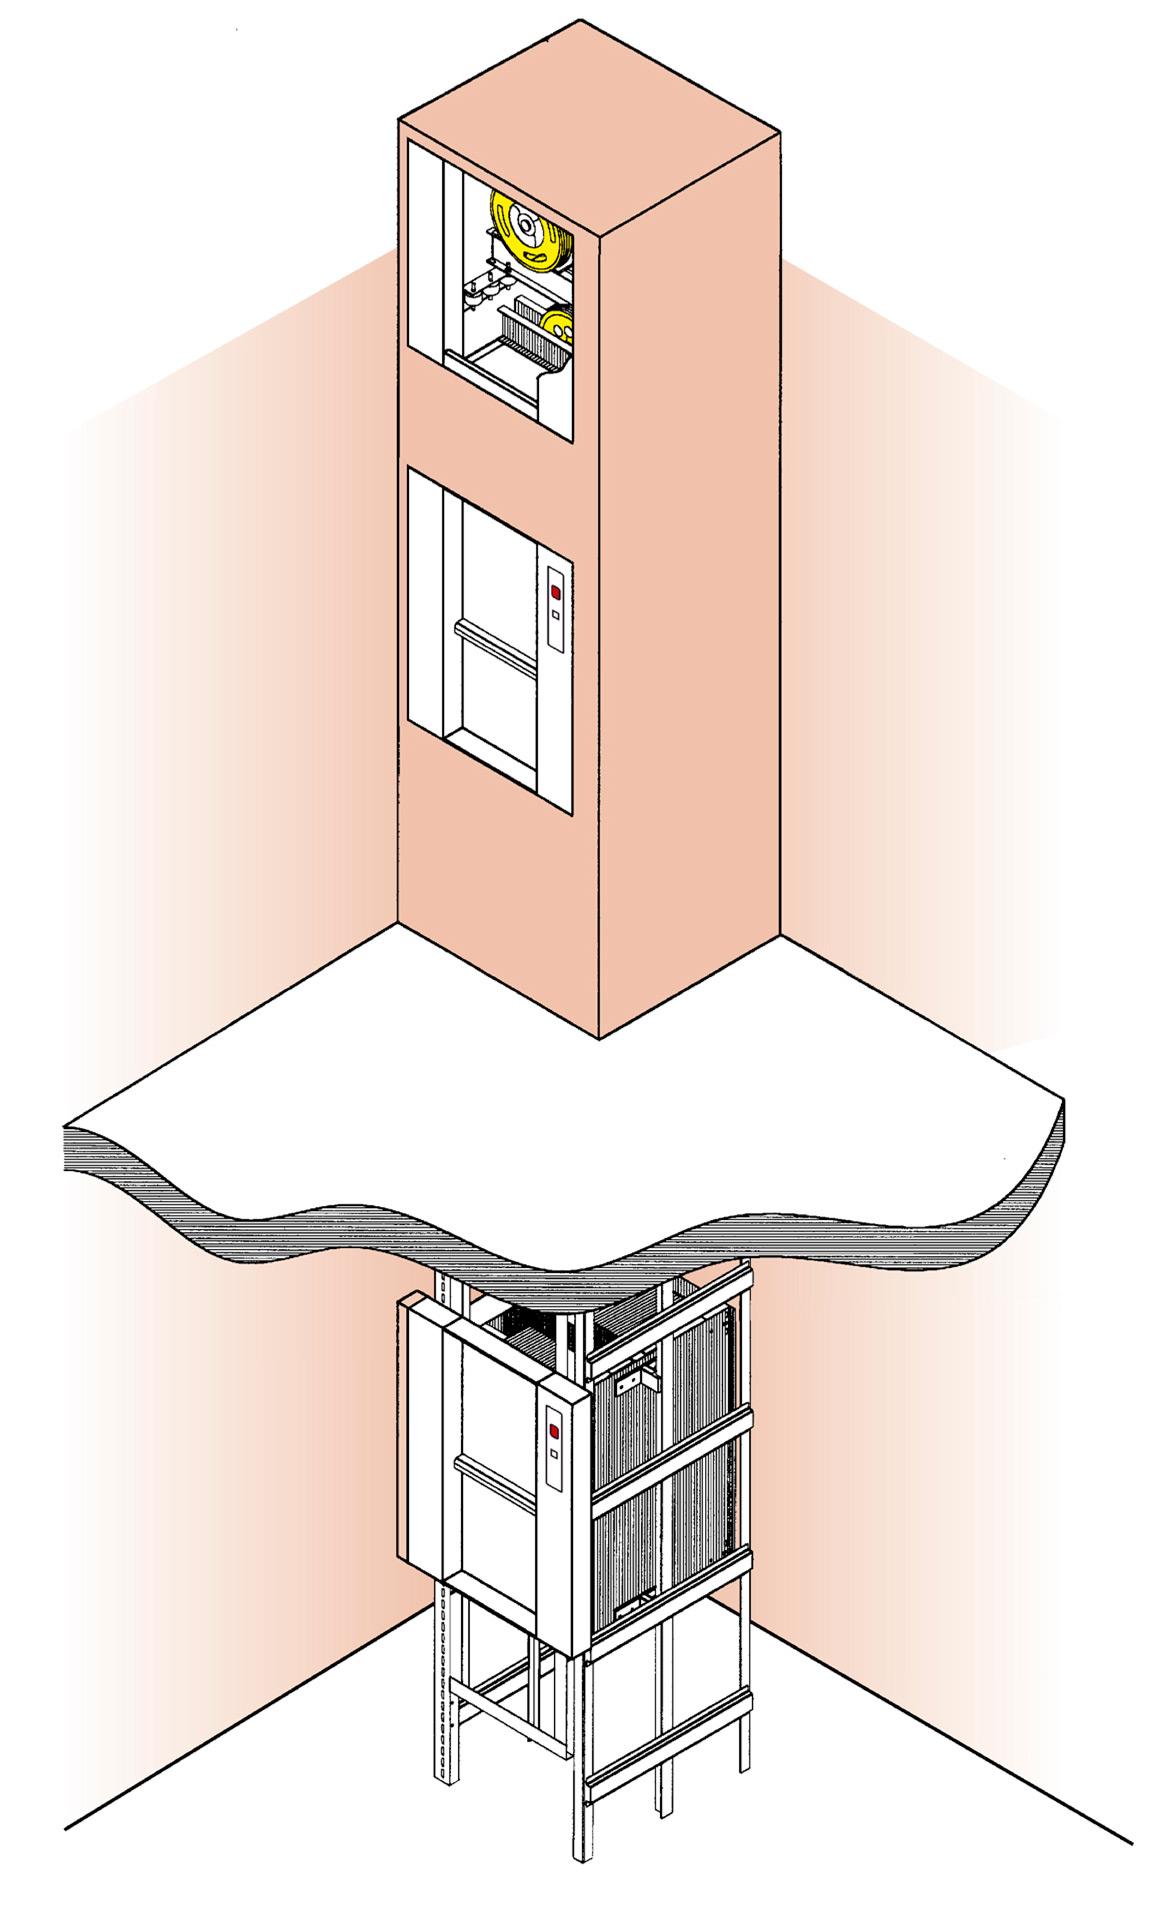 Service Lift Installation Illustration